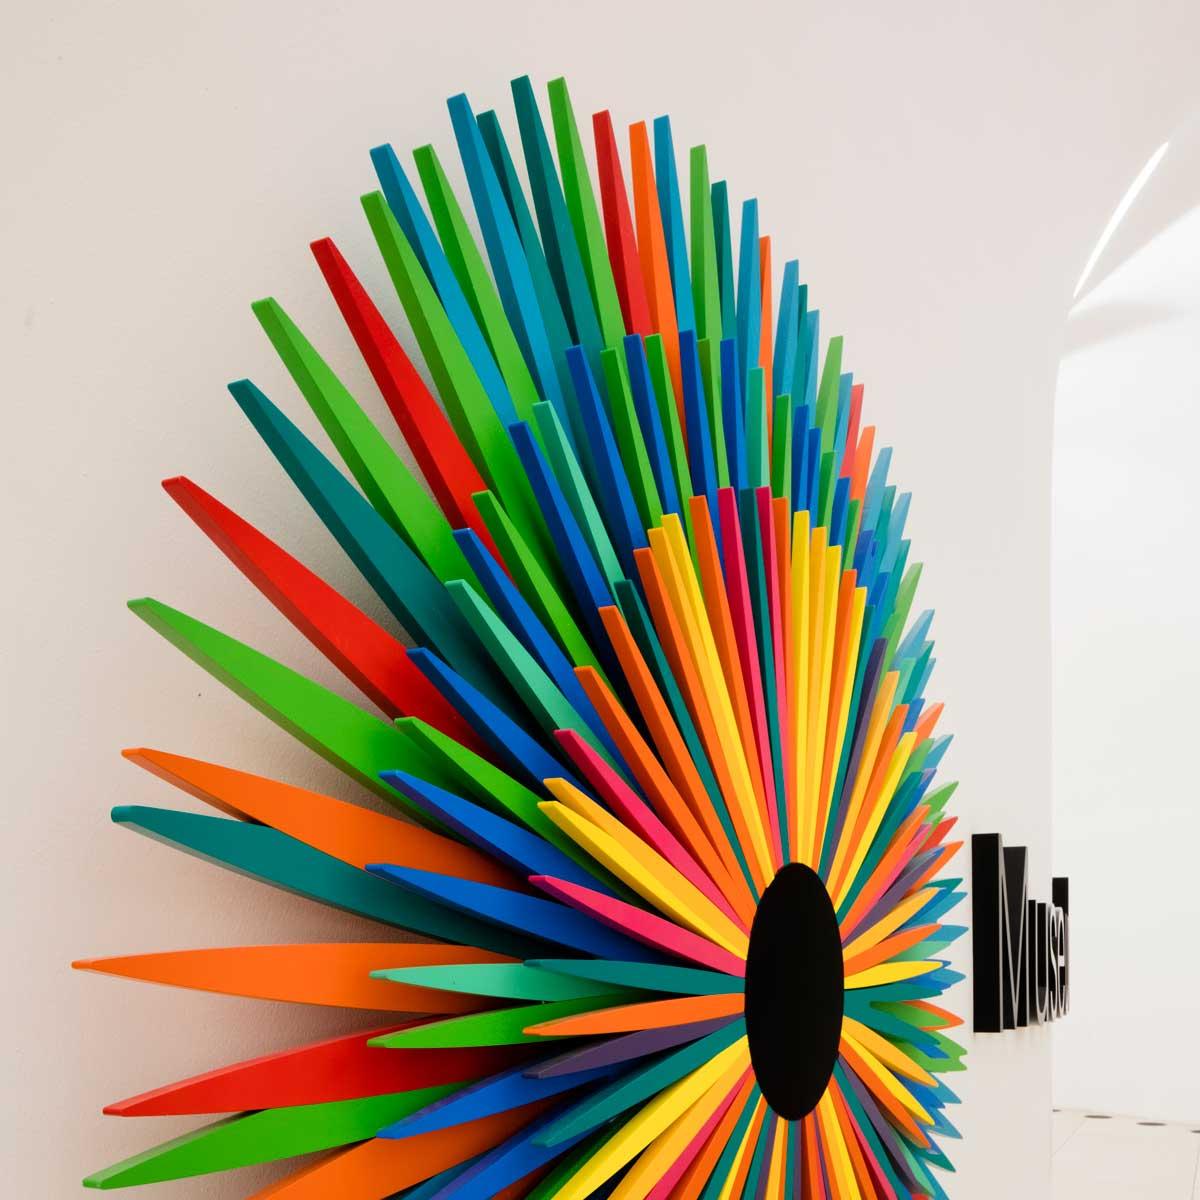 Museu do Amanhã, Rio de Janeiro, Brasil: logo i servisni pultovi, kreirani od DuPont™ Corian®; foto: Andres Otero, sva prava zadržana.